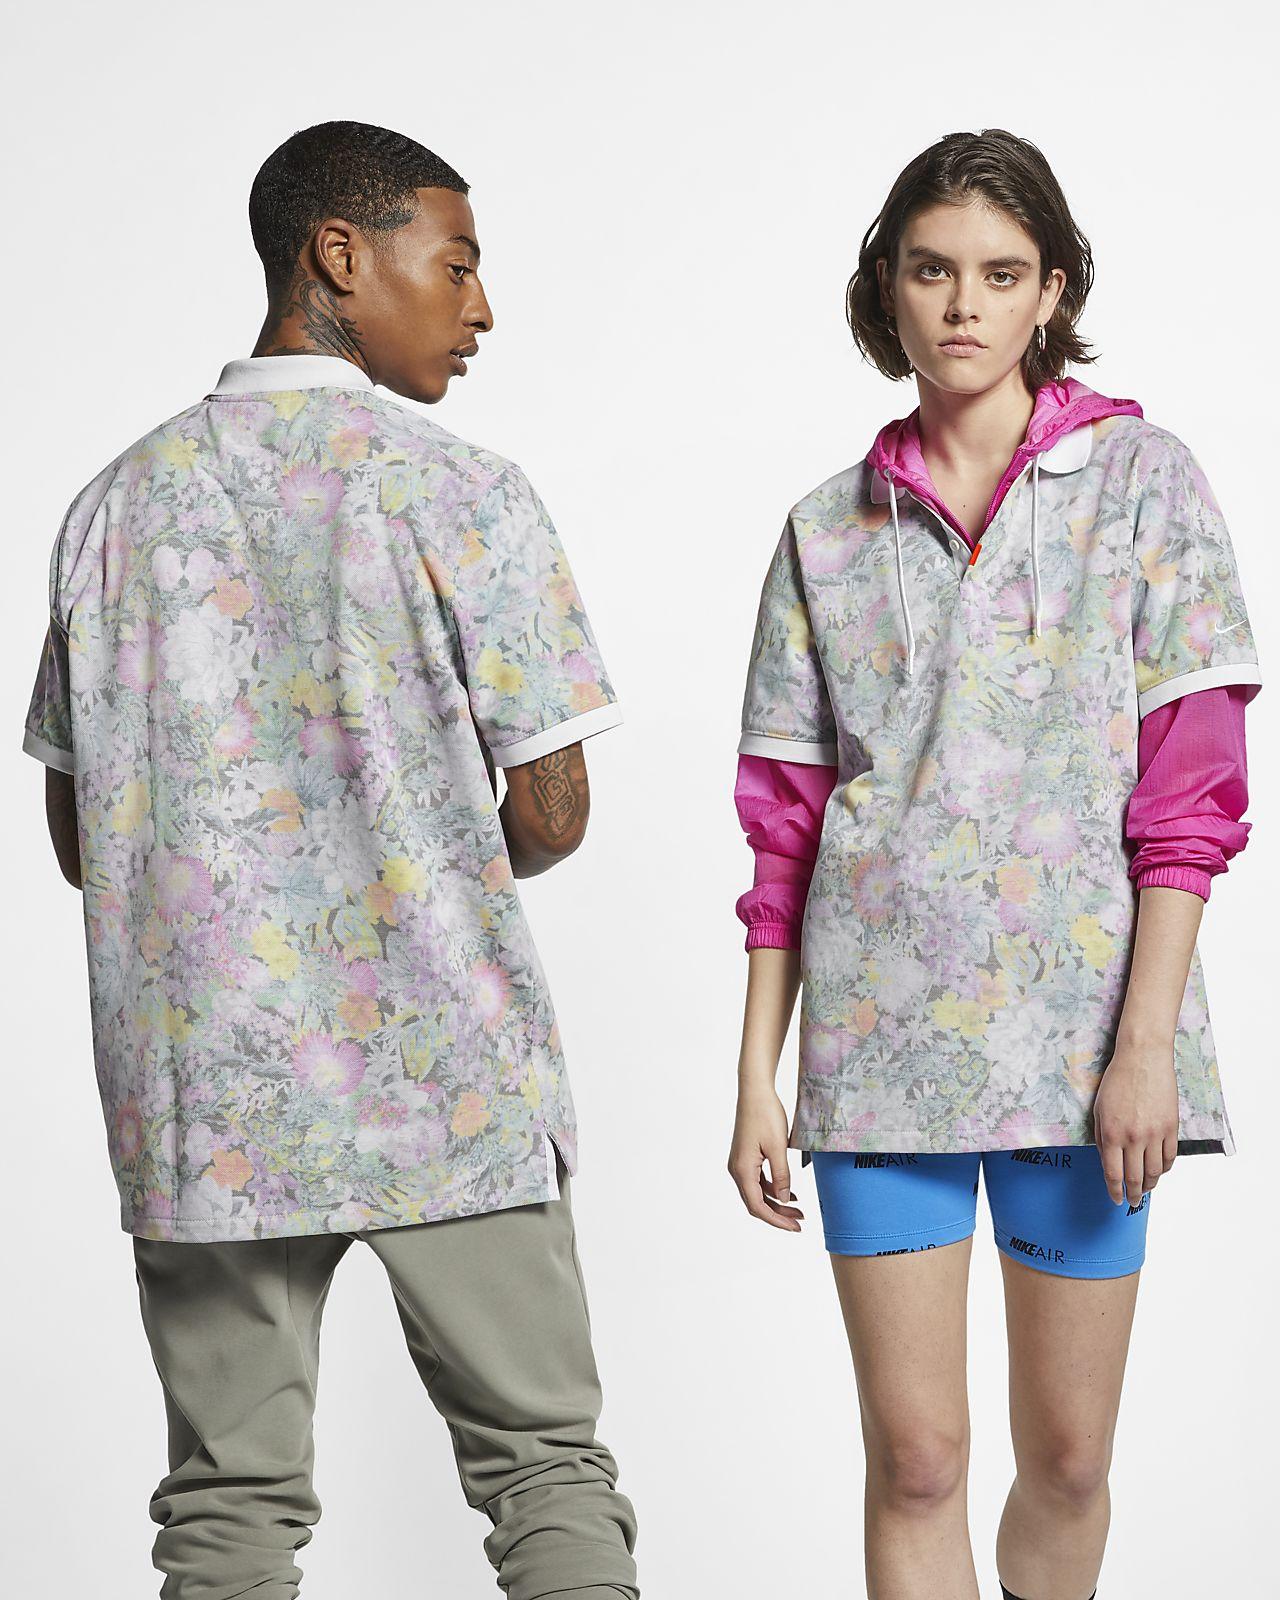 The Nike Polo Unisex Floral Polo